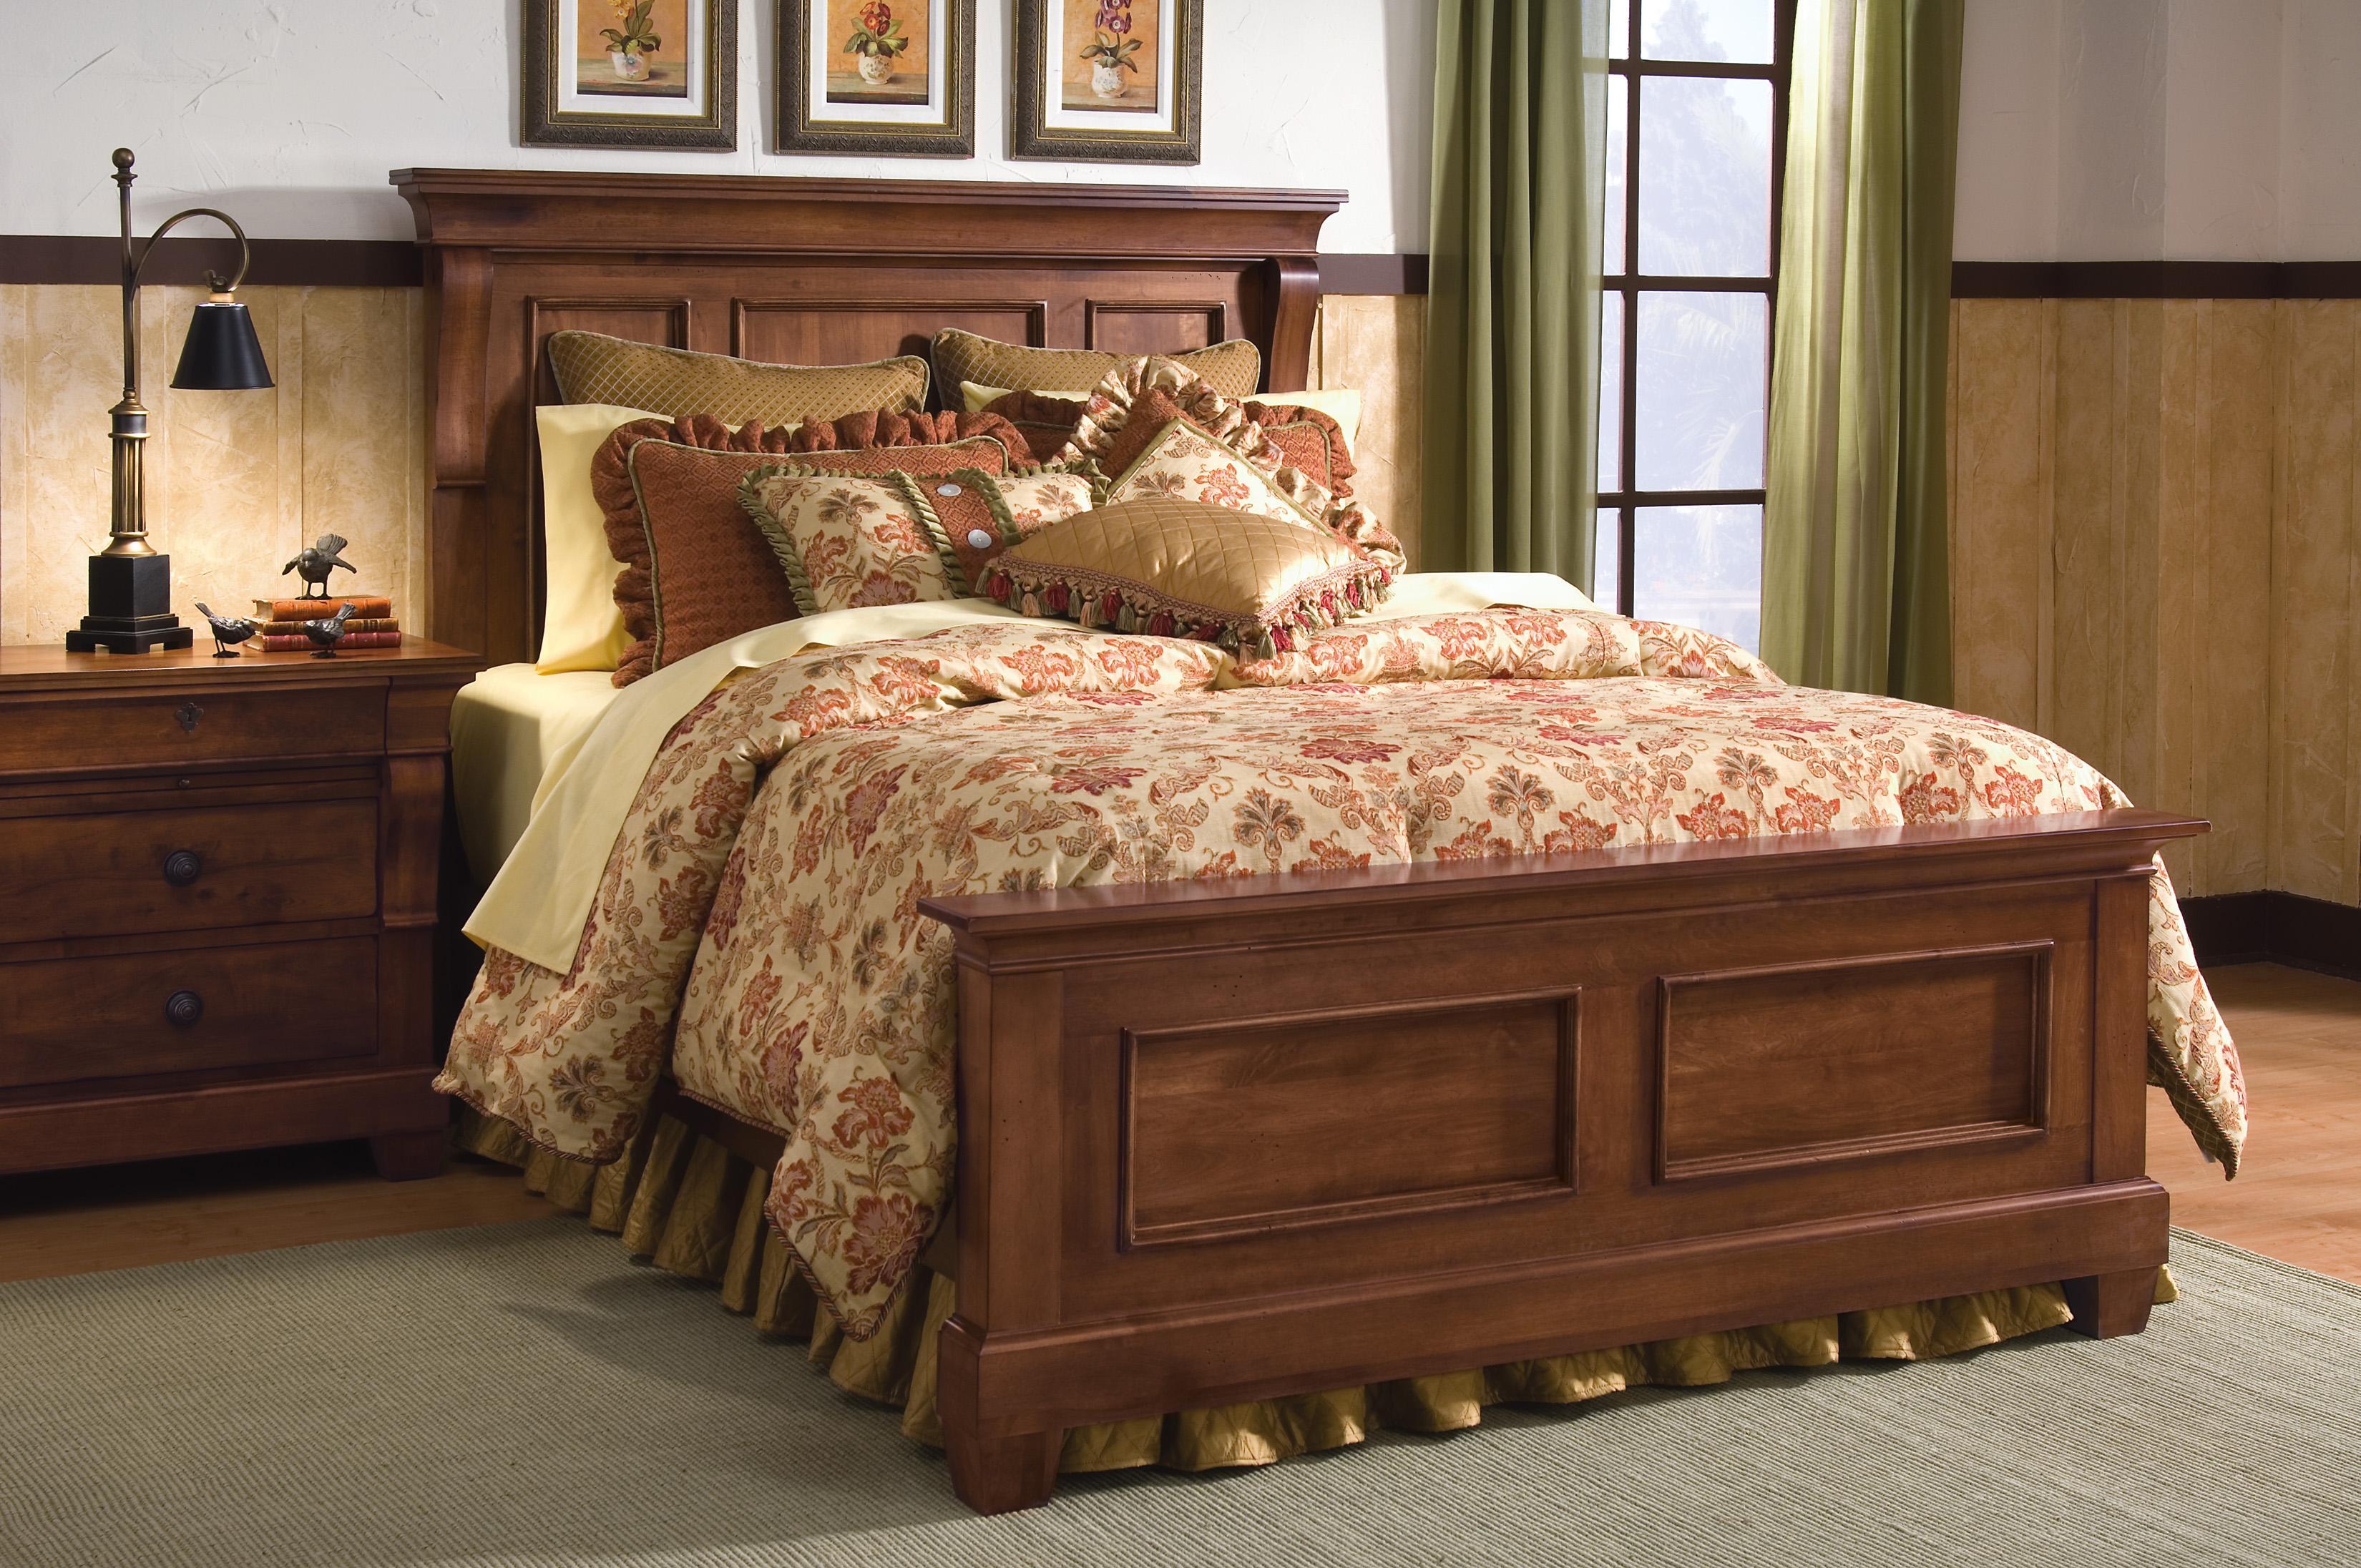 Kincaid furniture tuscano bedside chest johnny janosik for Kincaid american journal bedroom furniture